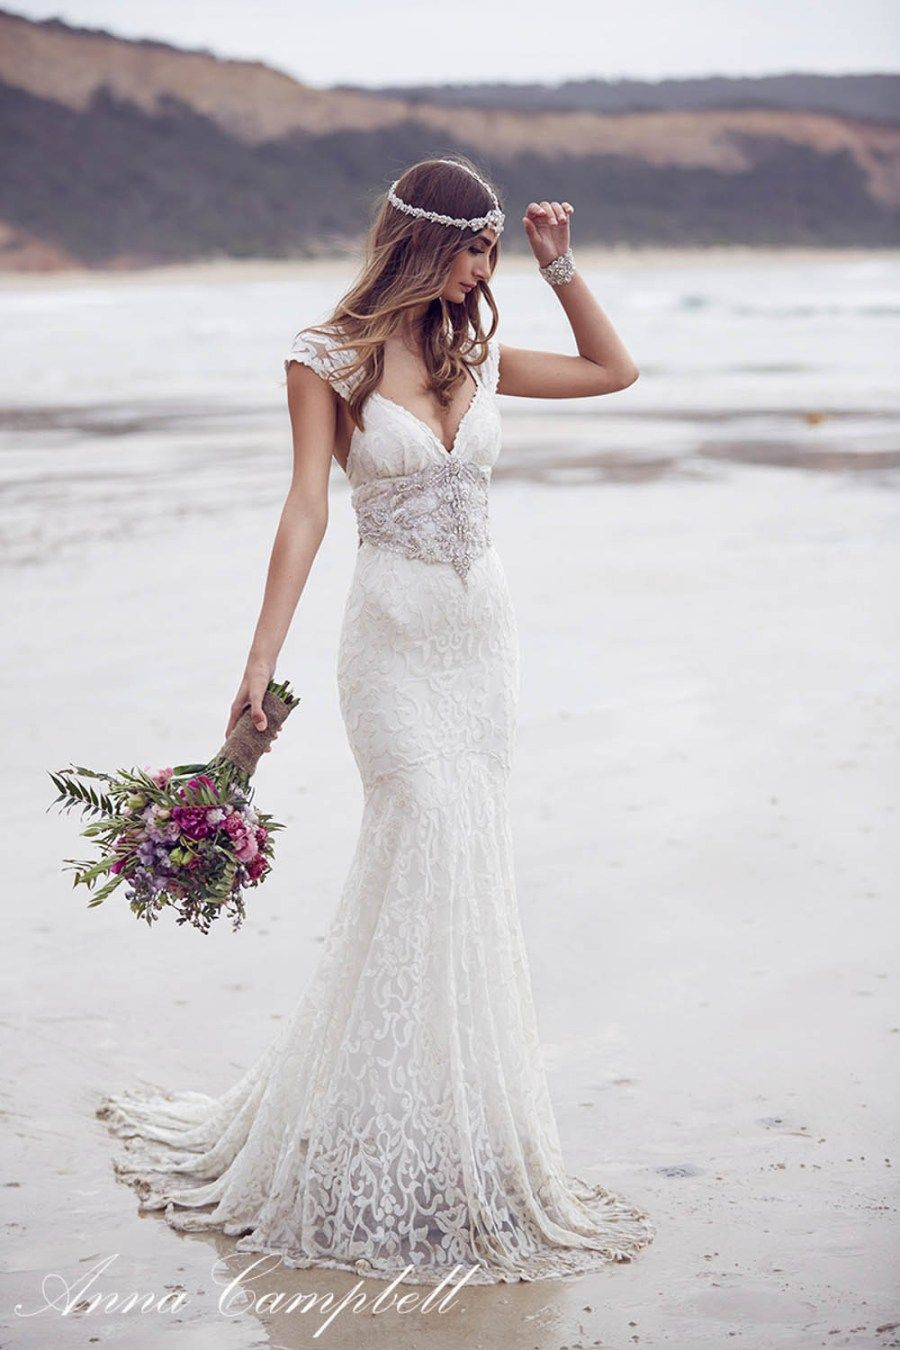 Wedding Dresses Anna Campbell Spirit Collection Perfete Anna Campbell Wedding Dress Vintage Inspired Wedding Dresses Wedding Dresses